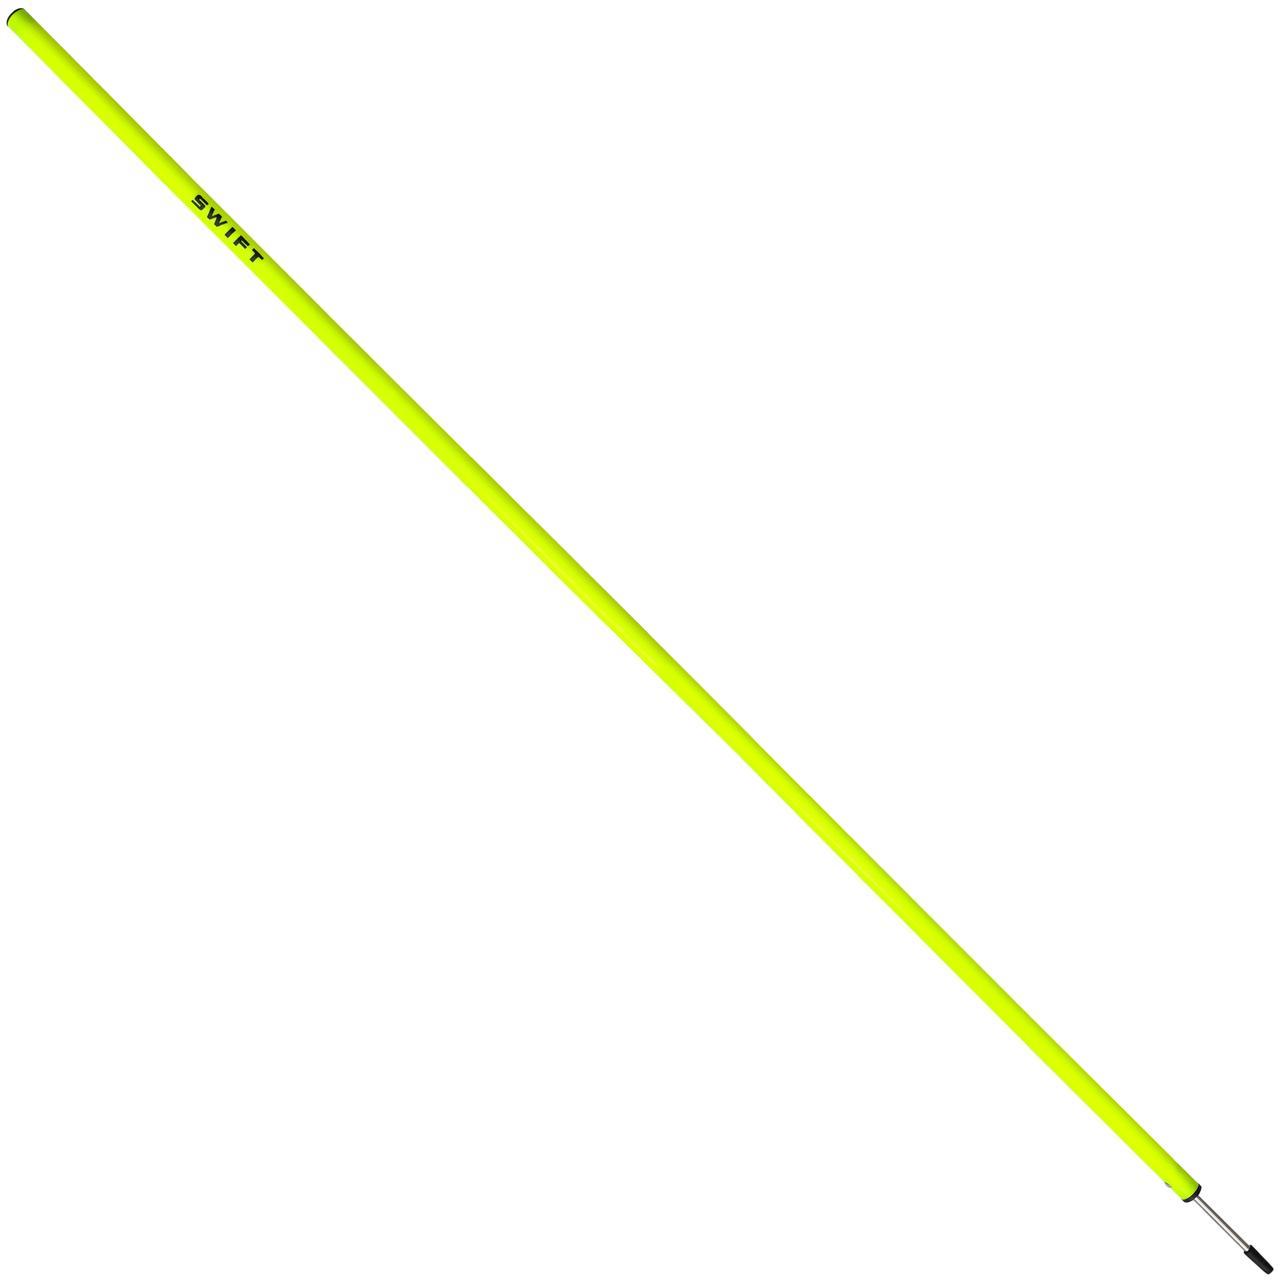 Жердина для слалому SWIFT Agility Pole With Spike, жовтий, 160 см, d 30 мм